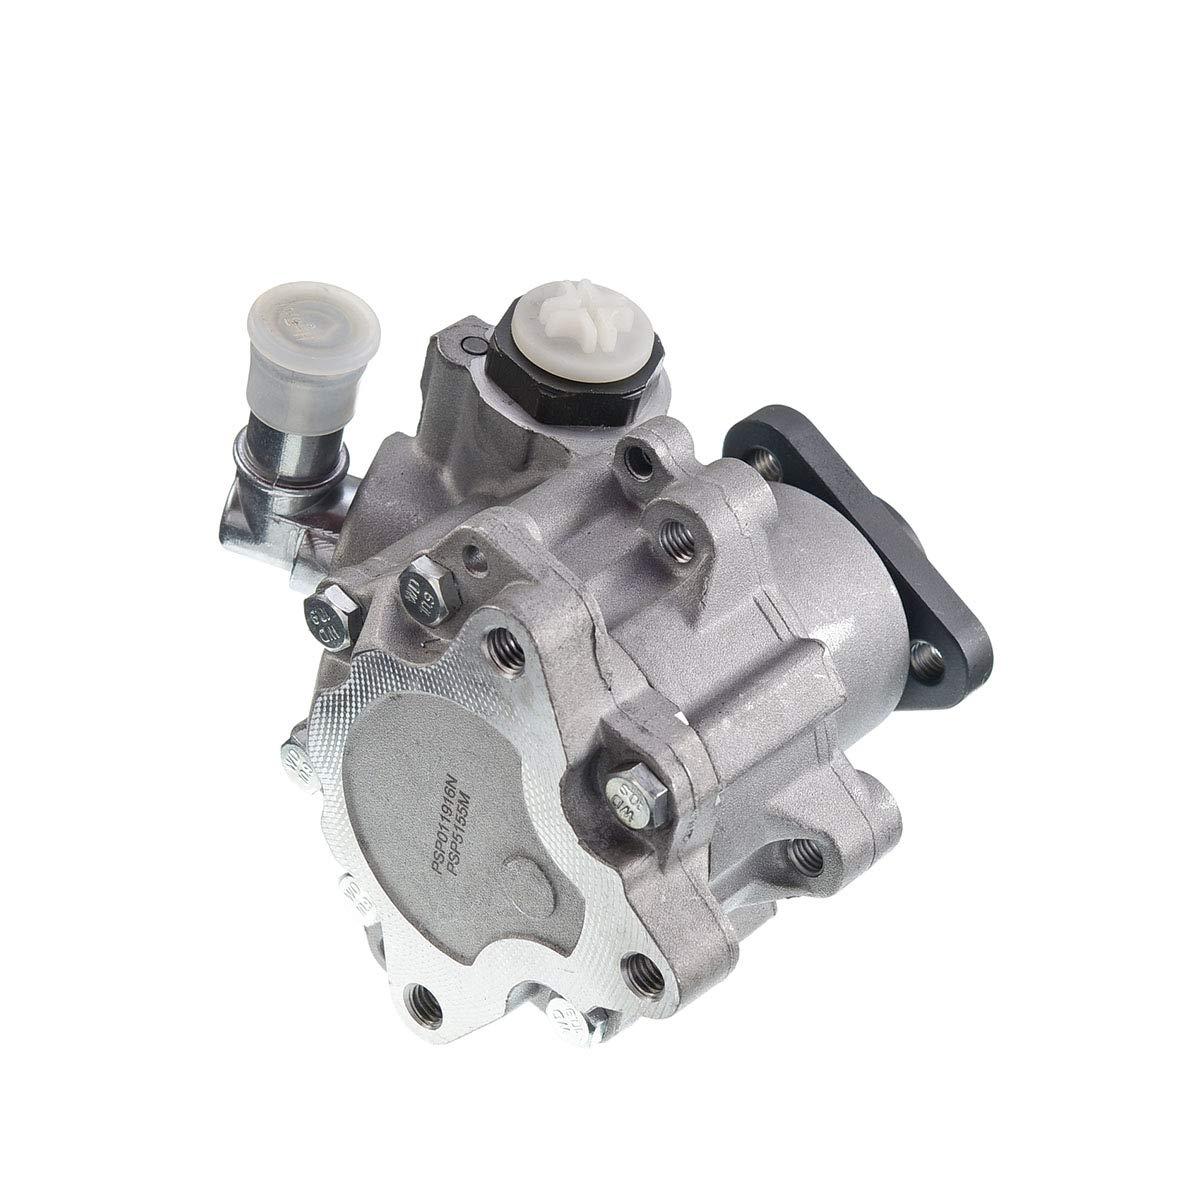 Servo Pompe hydraulique pour A6 4A C4 4B C5 1995-2005 4B0145155R